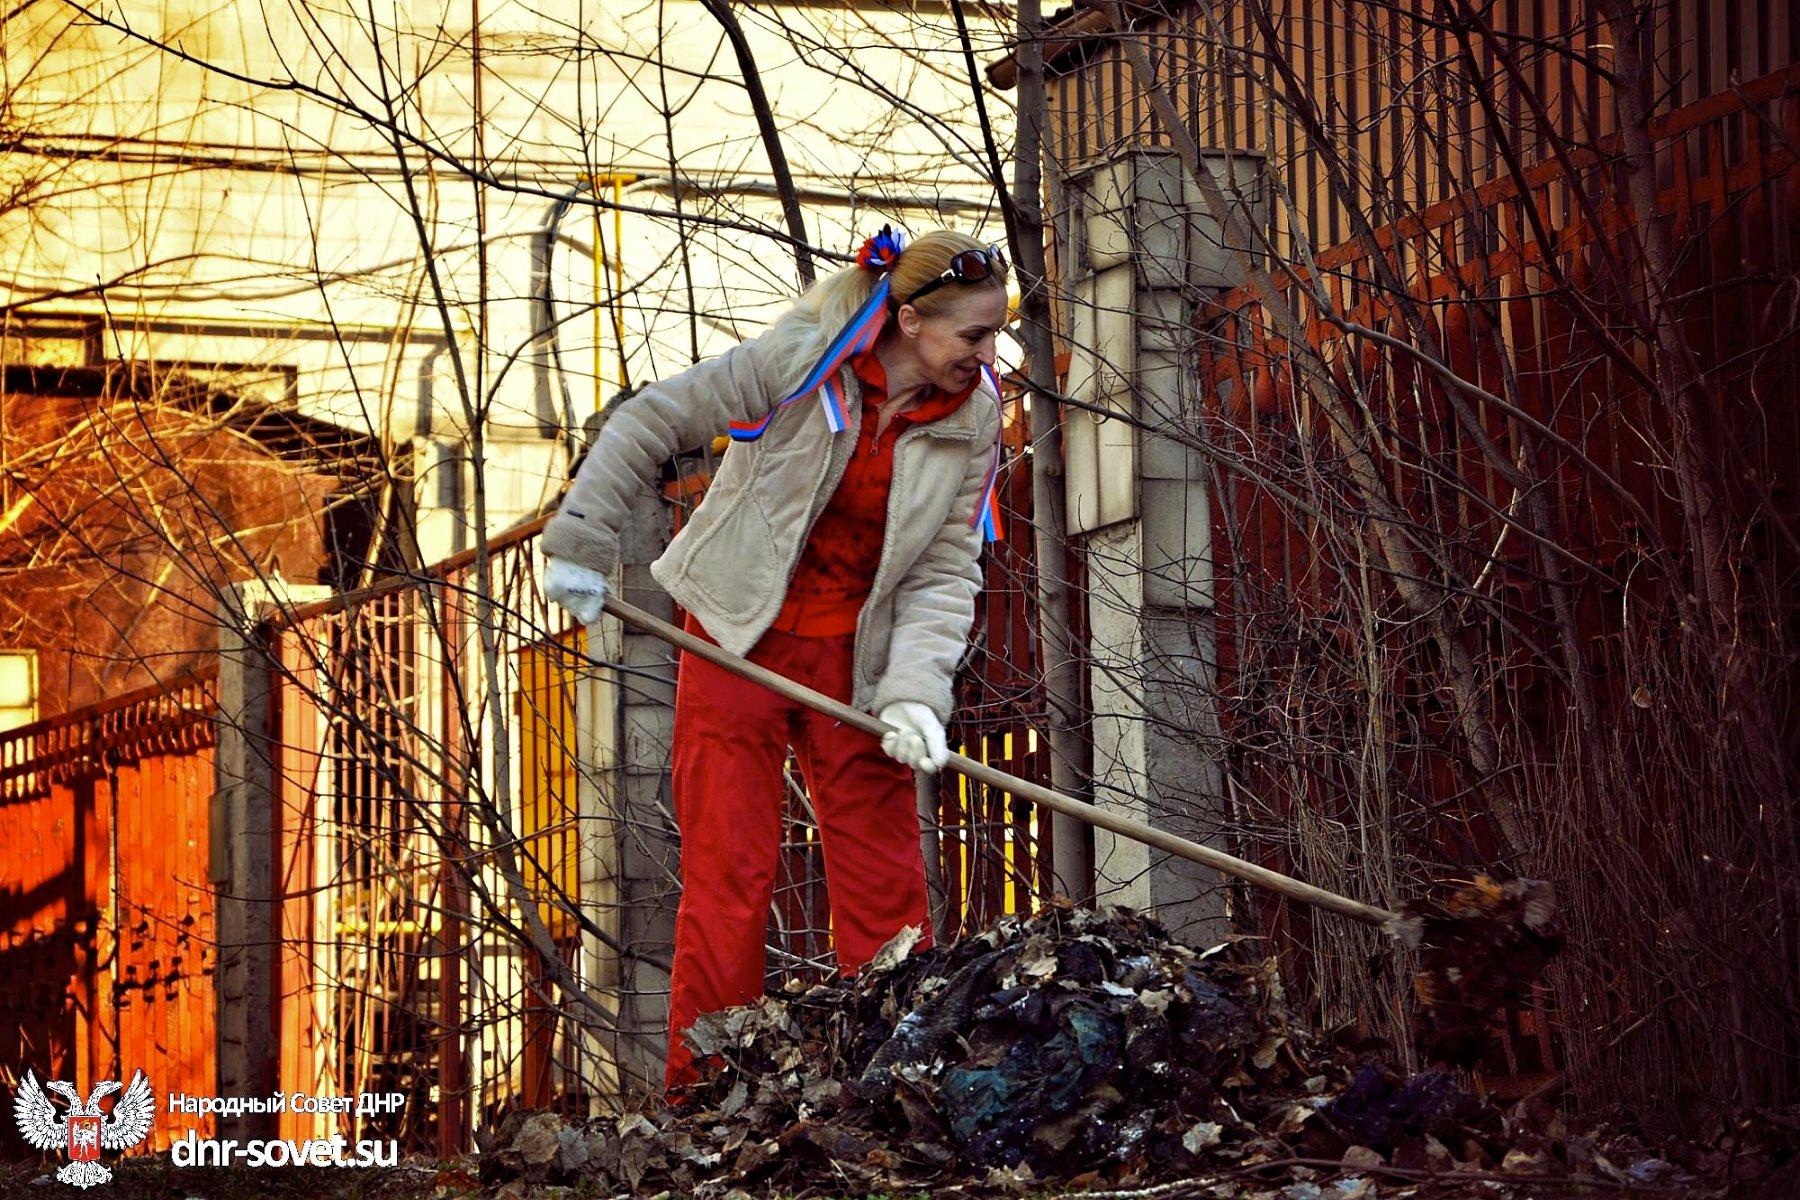 00 subbotnik cleanup in Donetsk. 22.03.15